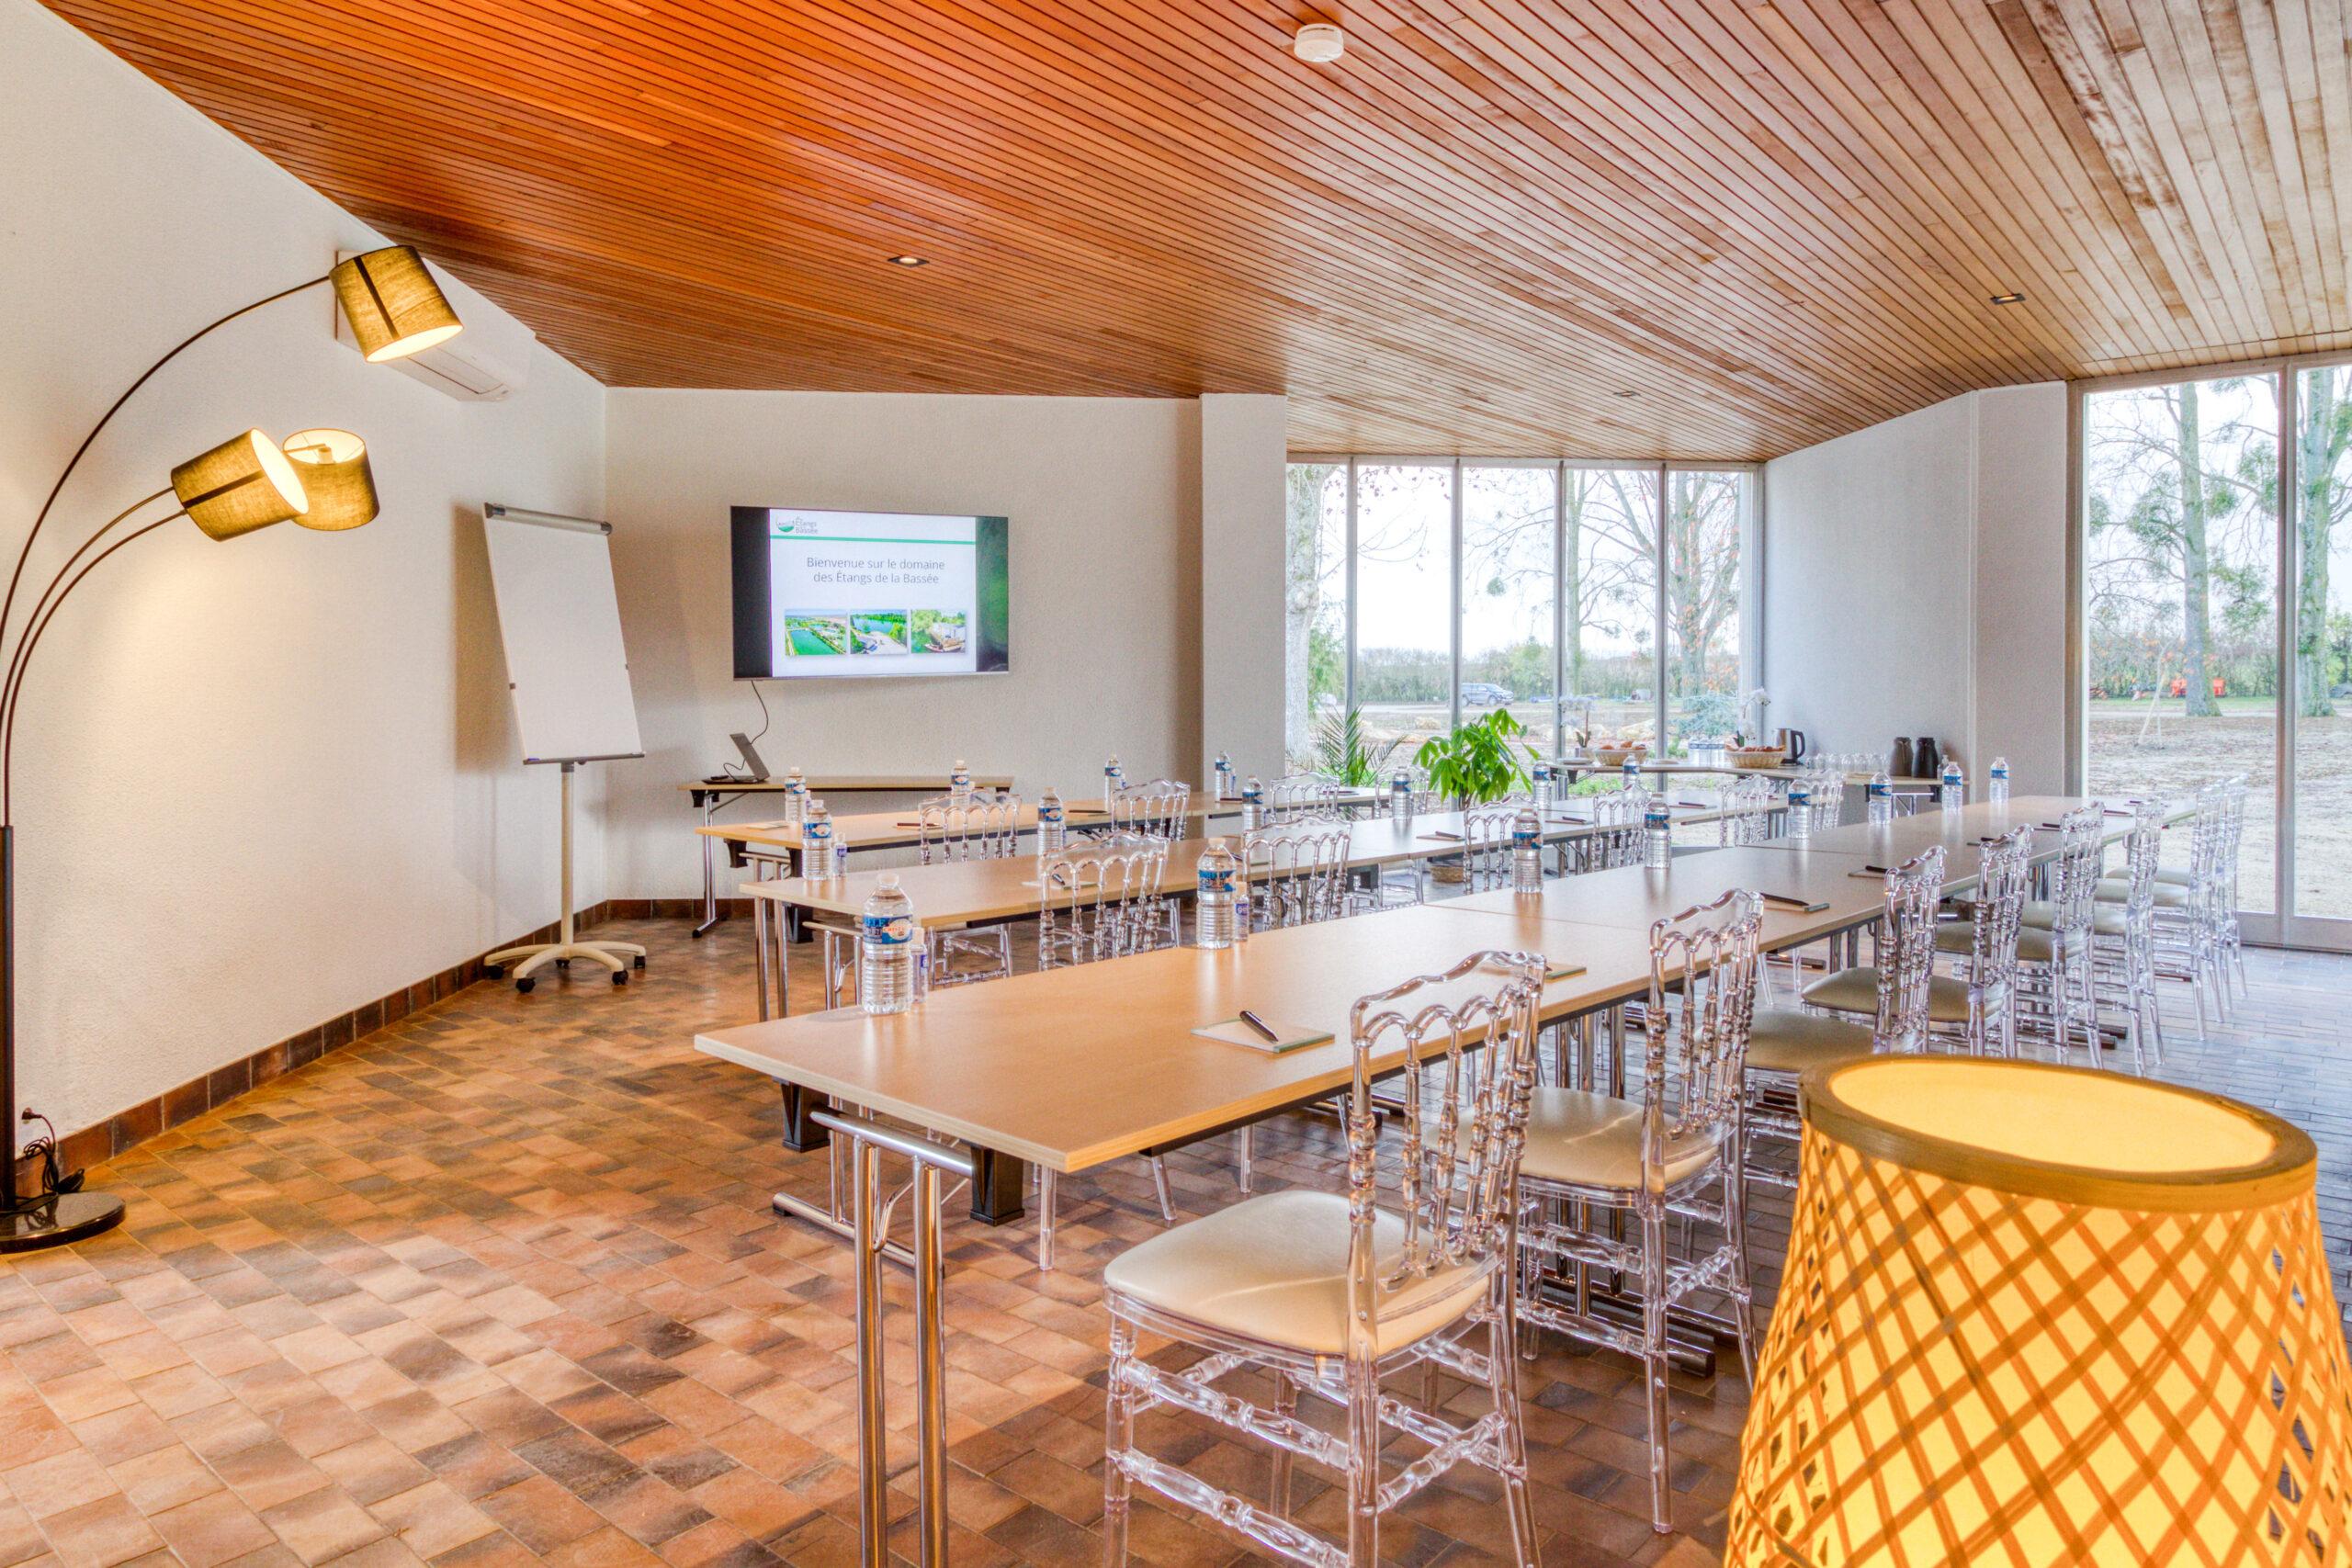 Seminaire villa etangsdelabassee ABC salles 1 modifie scaled